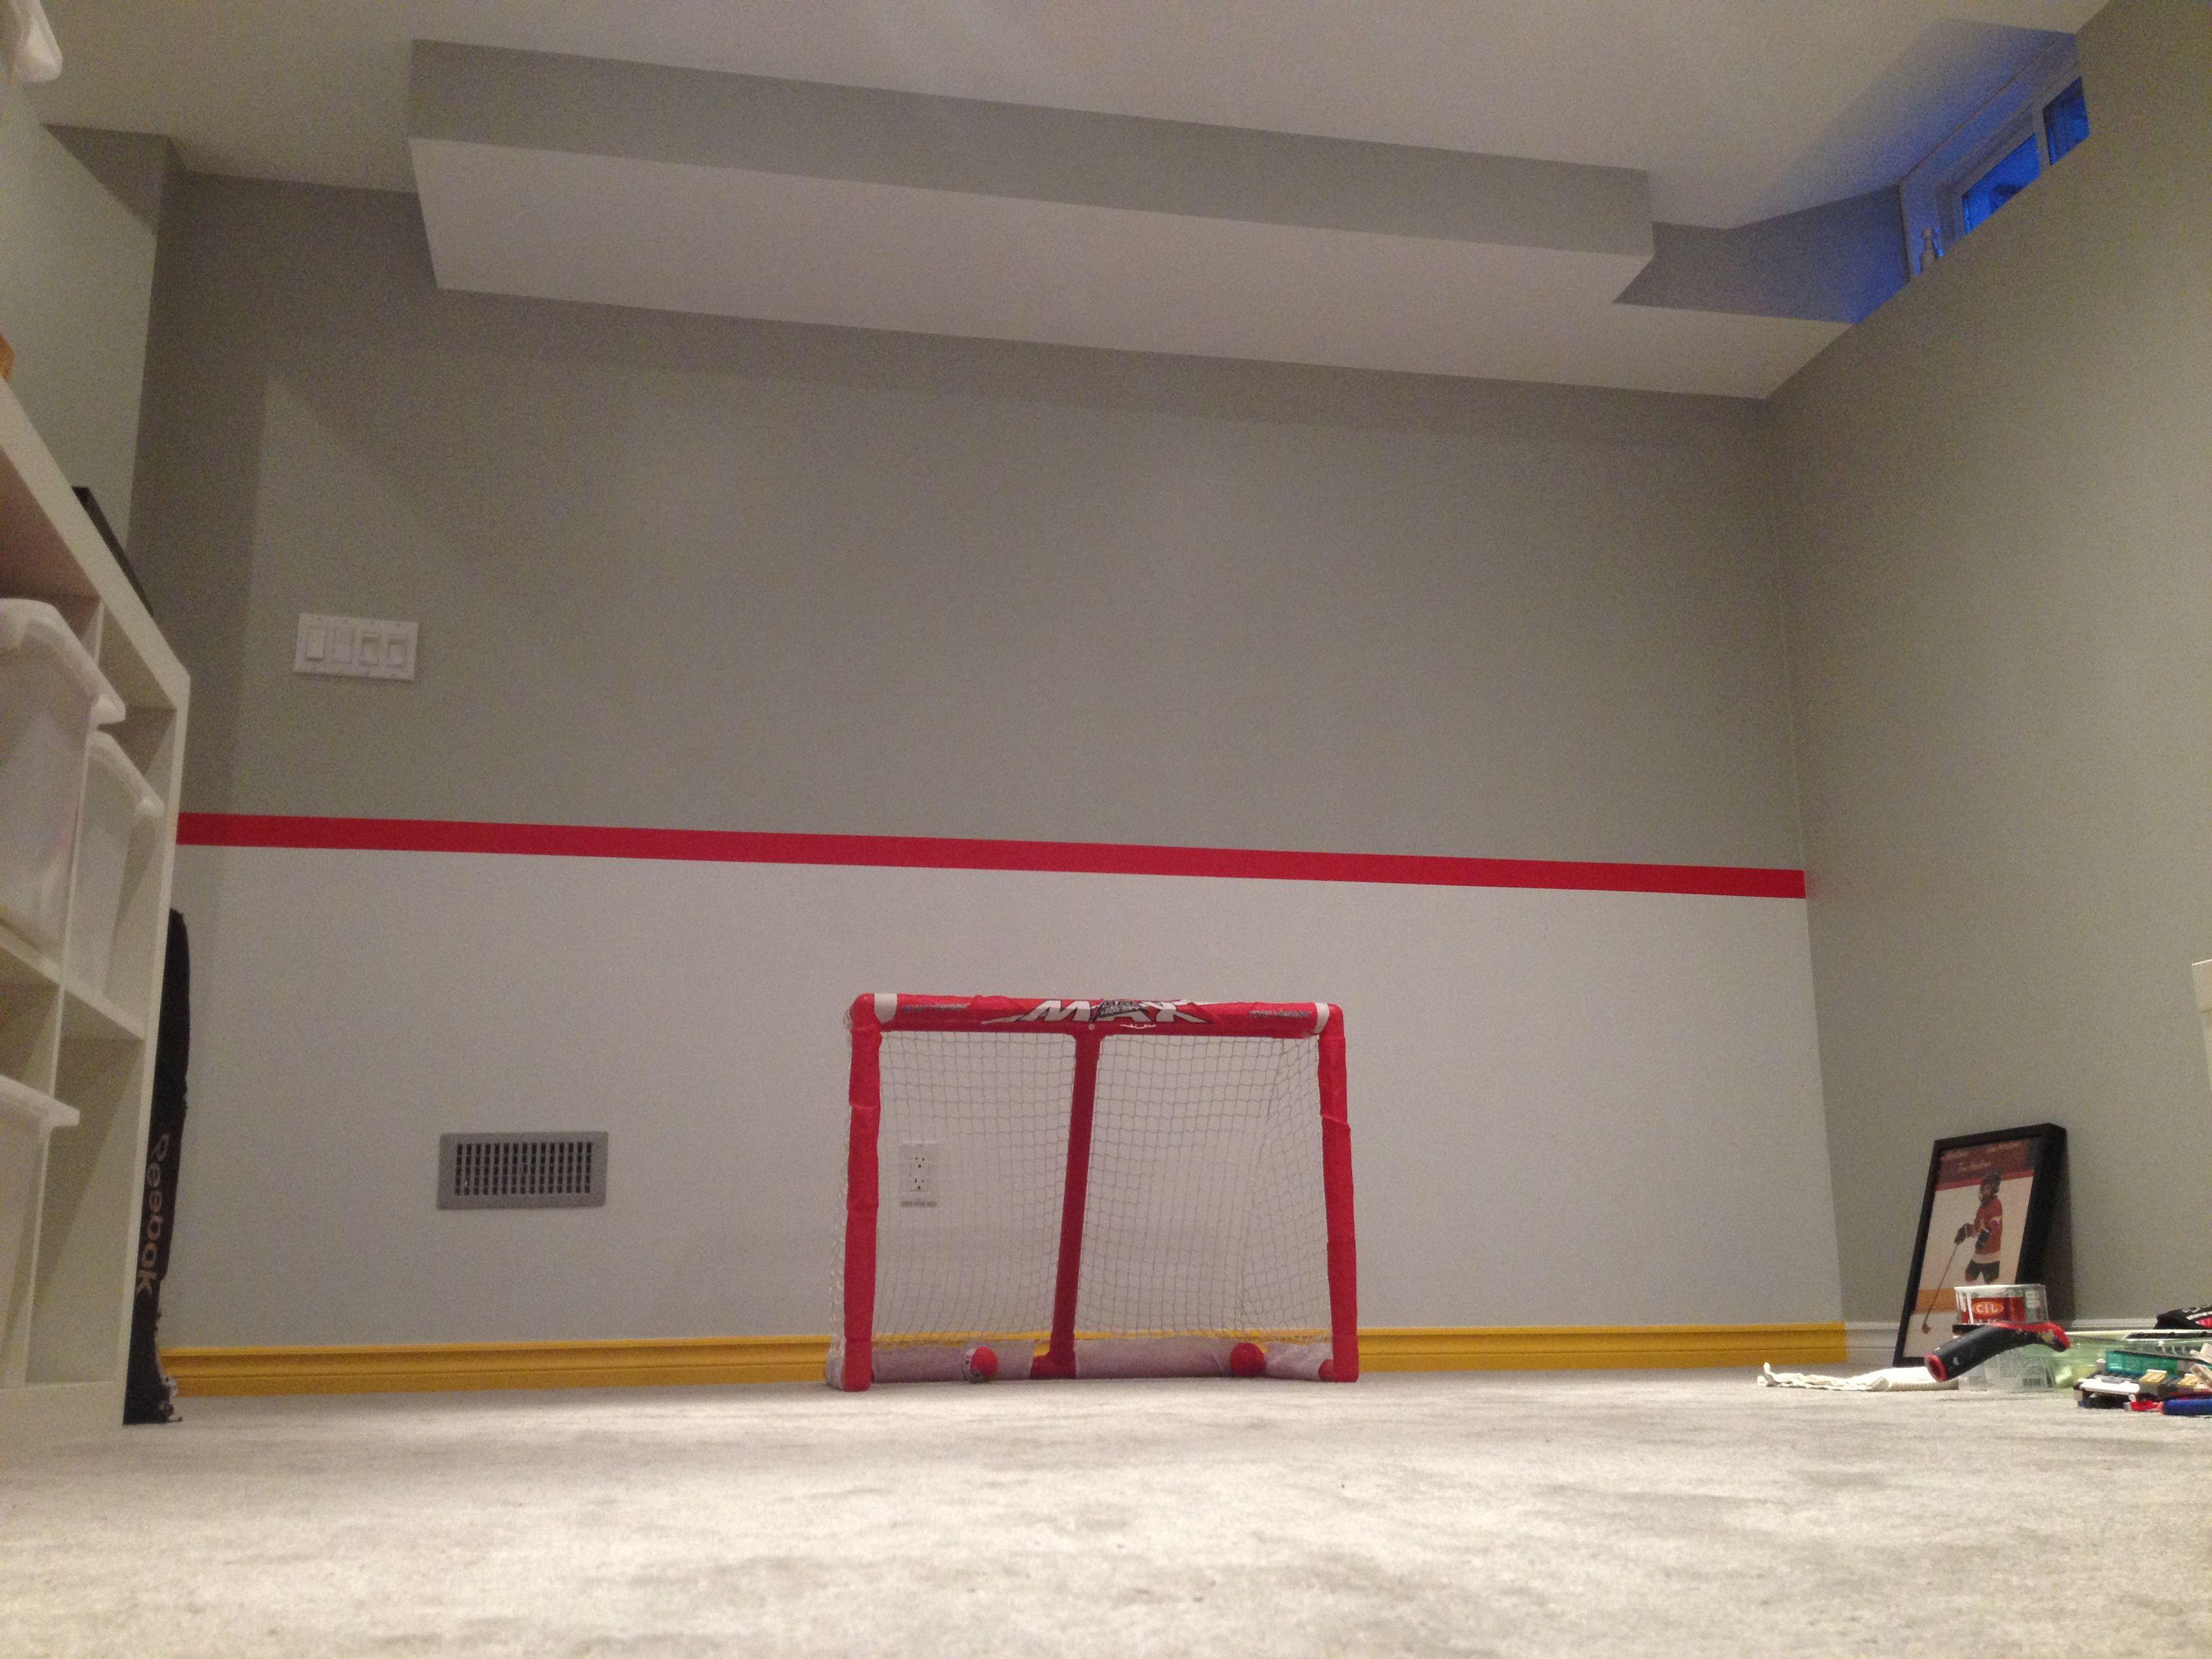 Kids Playroom Wall Painted To Look Like Hockey Rink Boards